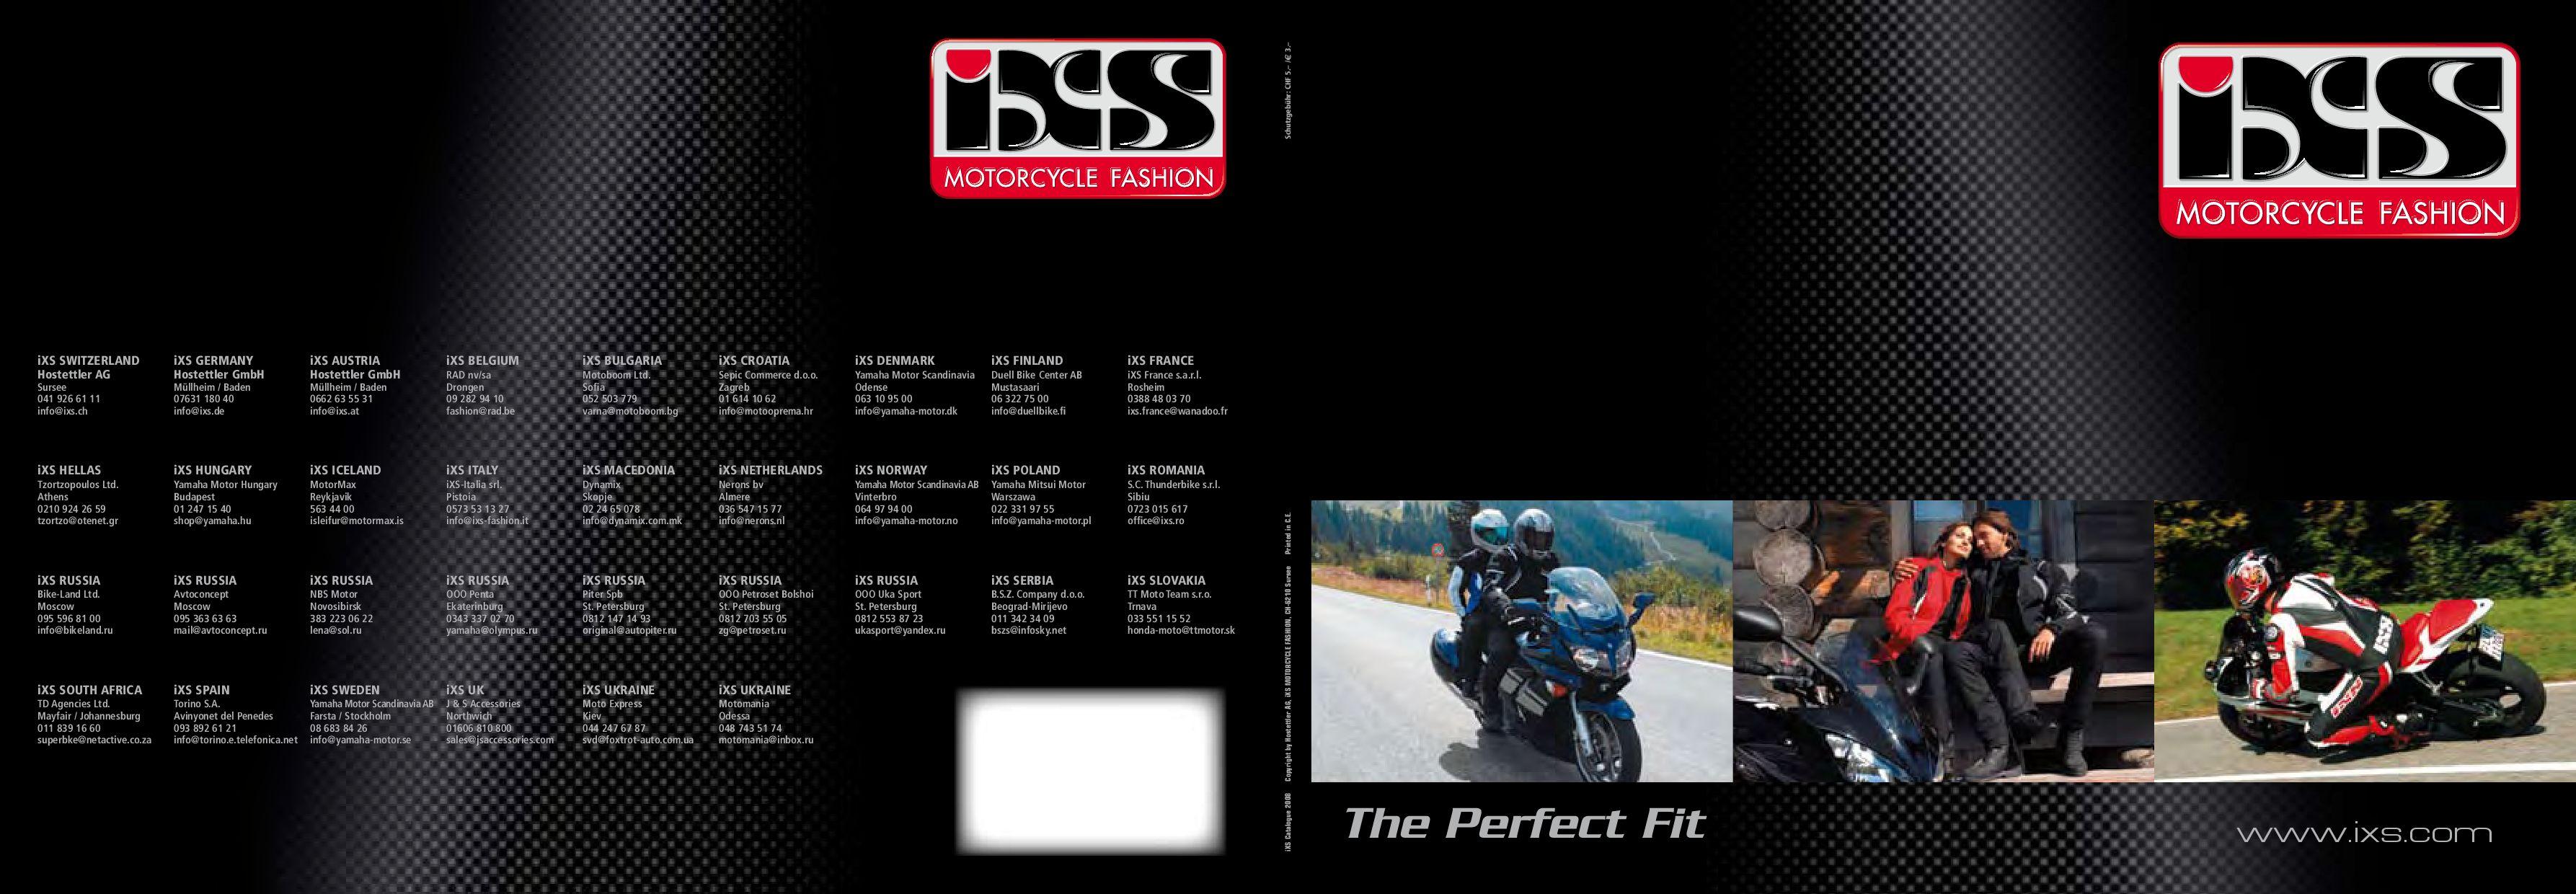 Motorcycle gloves ixs - Motorcycle Gloves Ixs 37